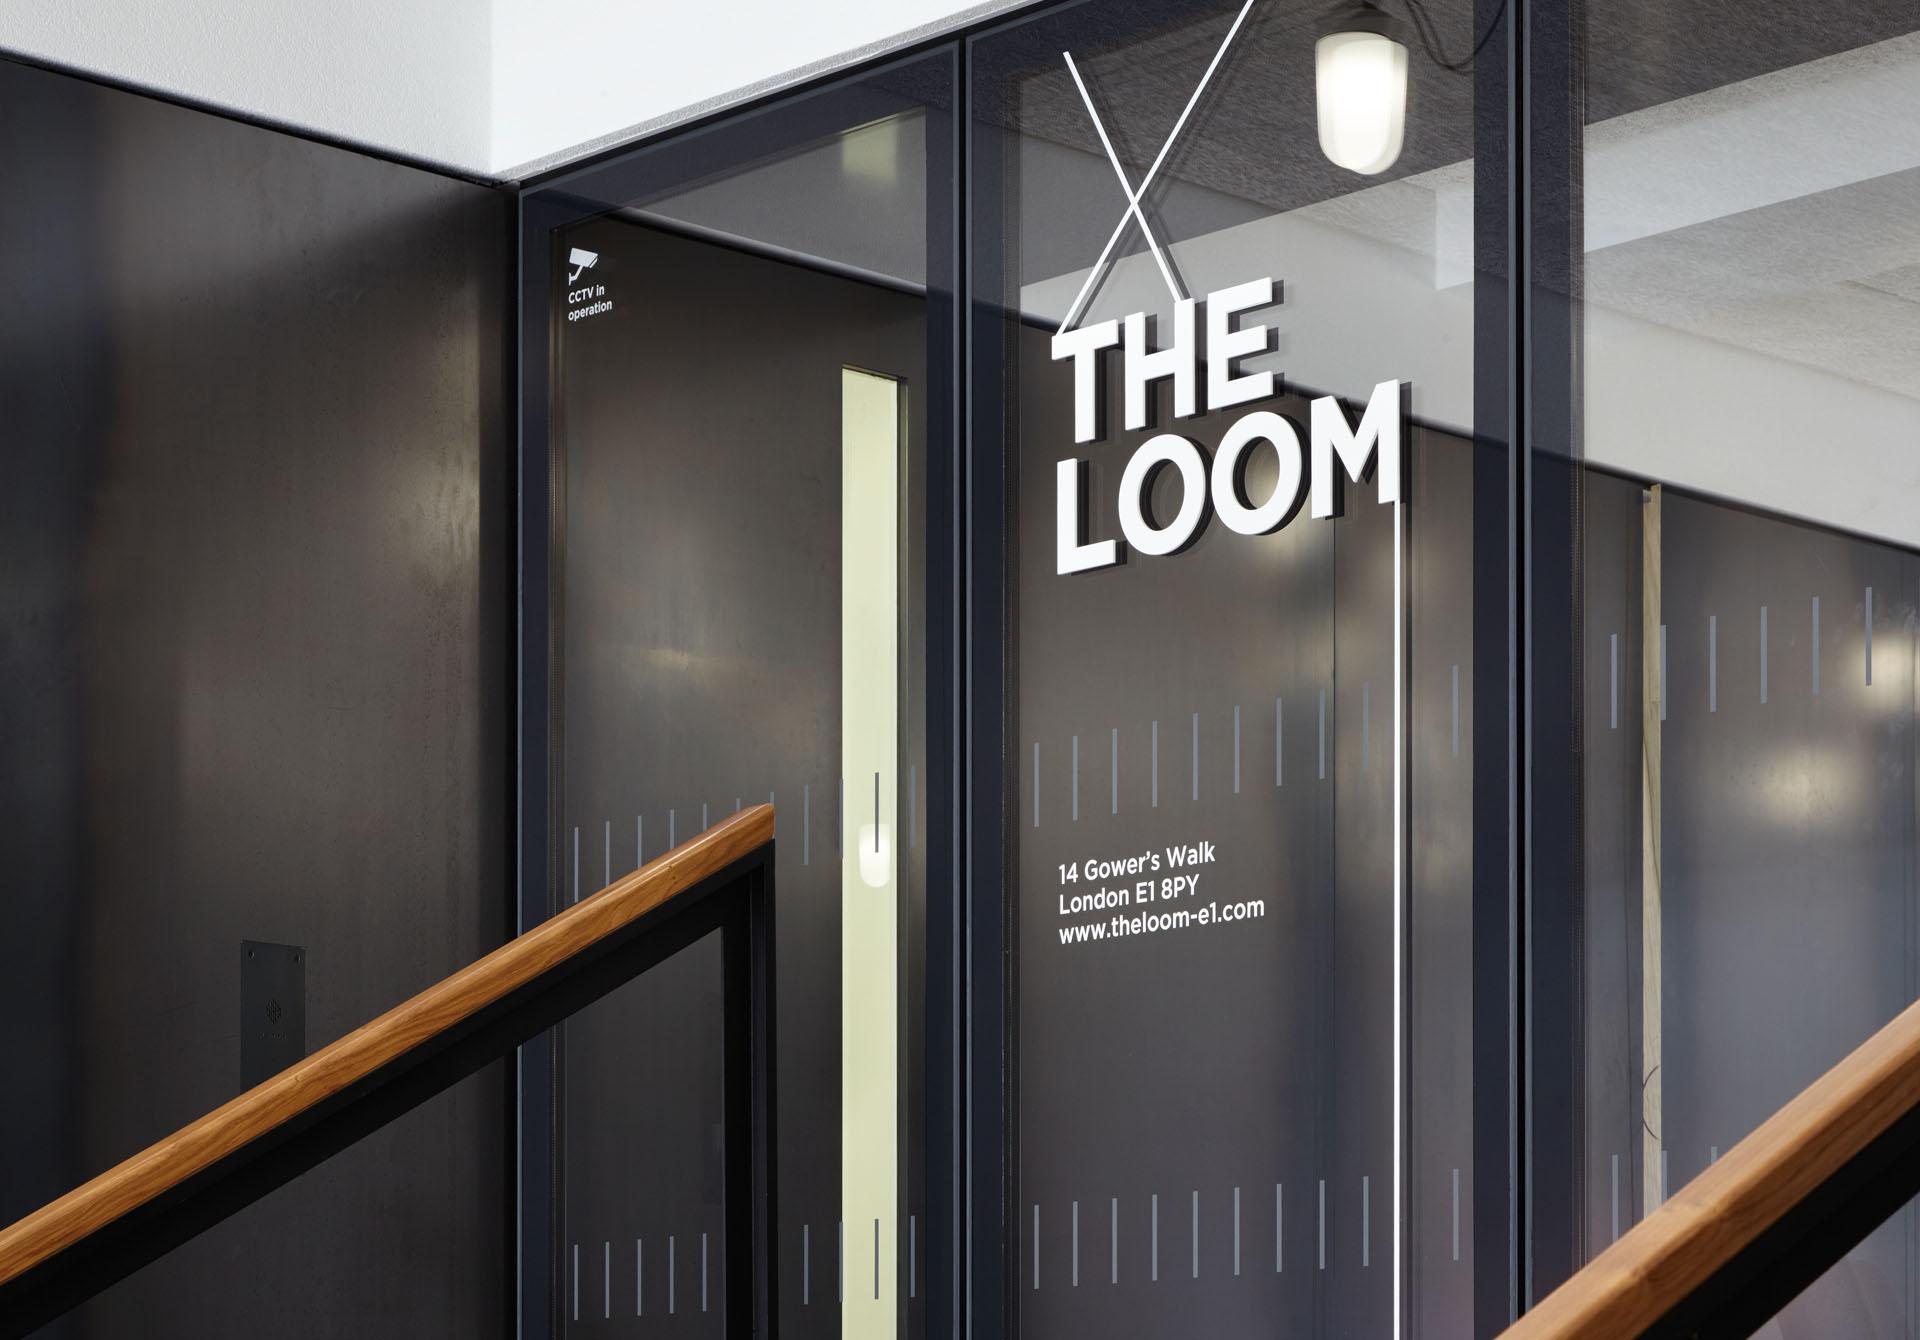 5-The Loom